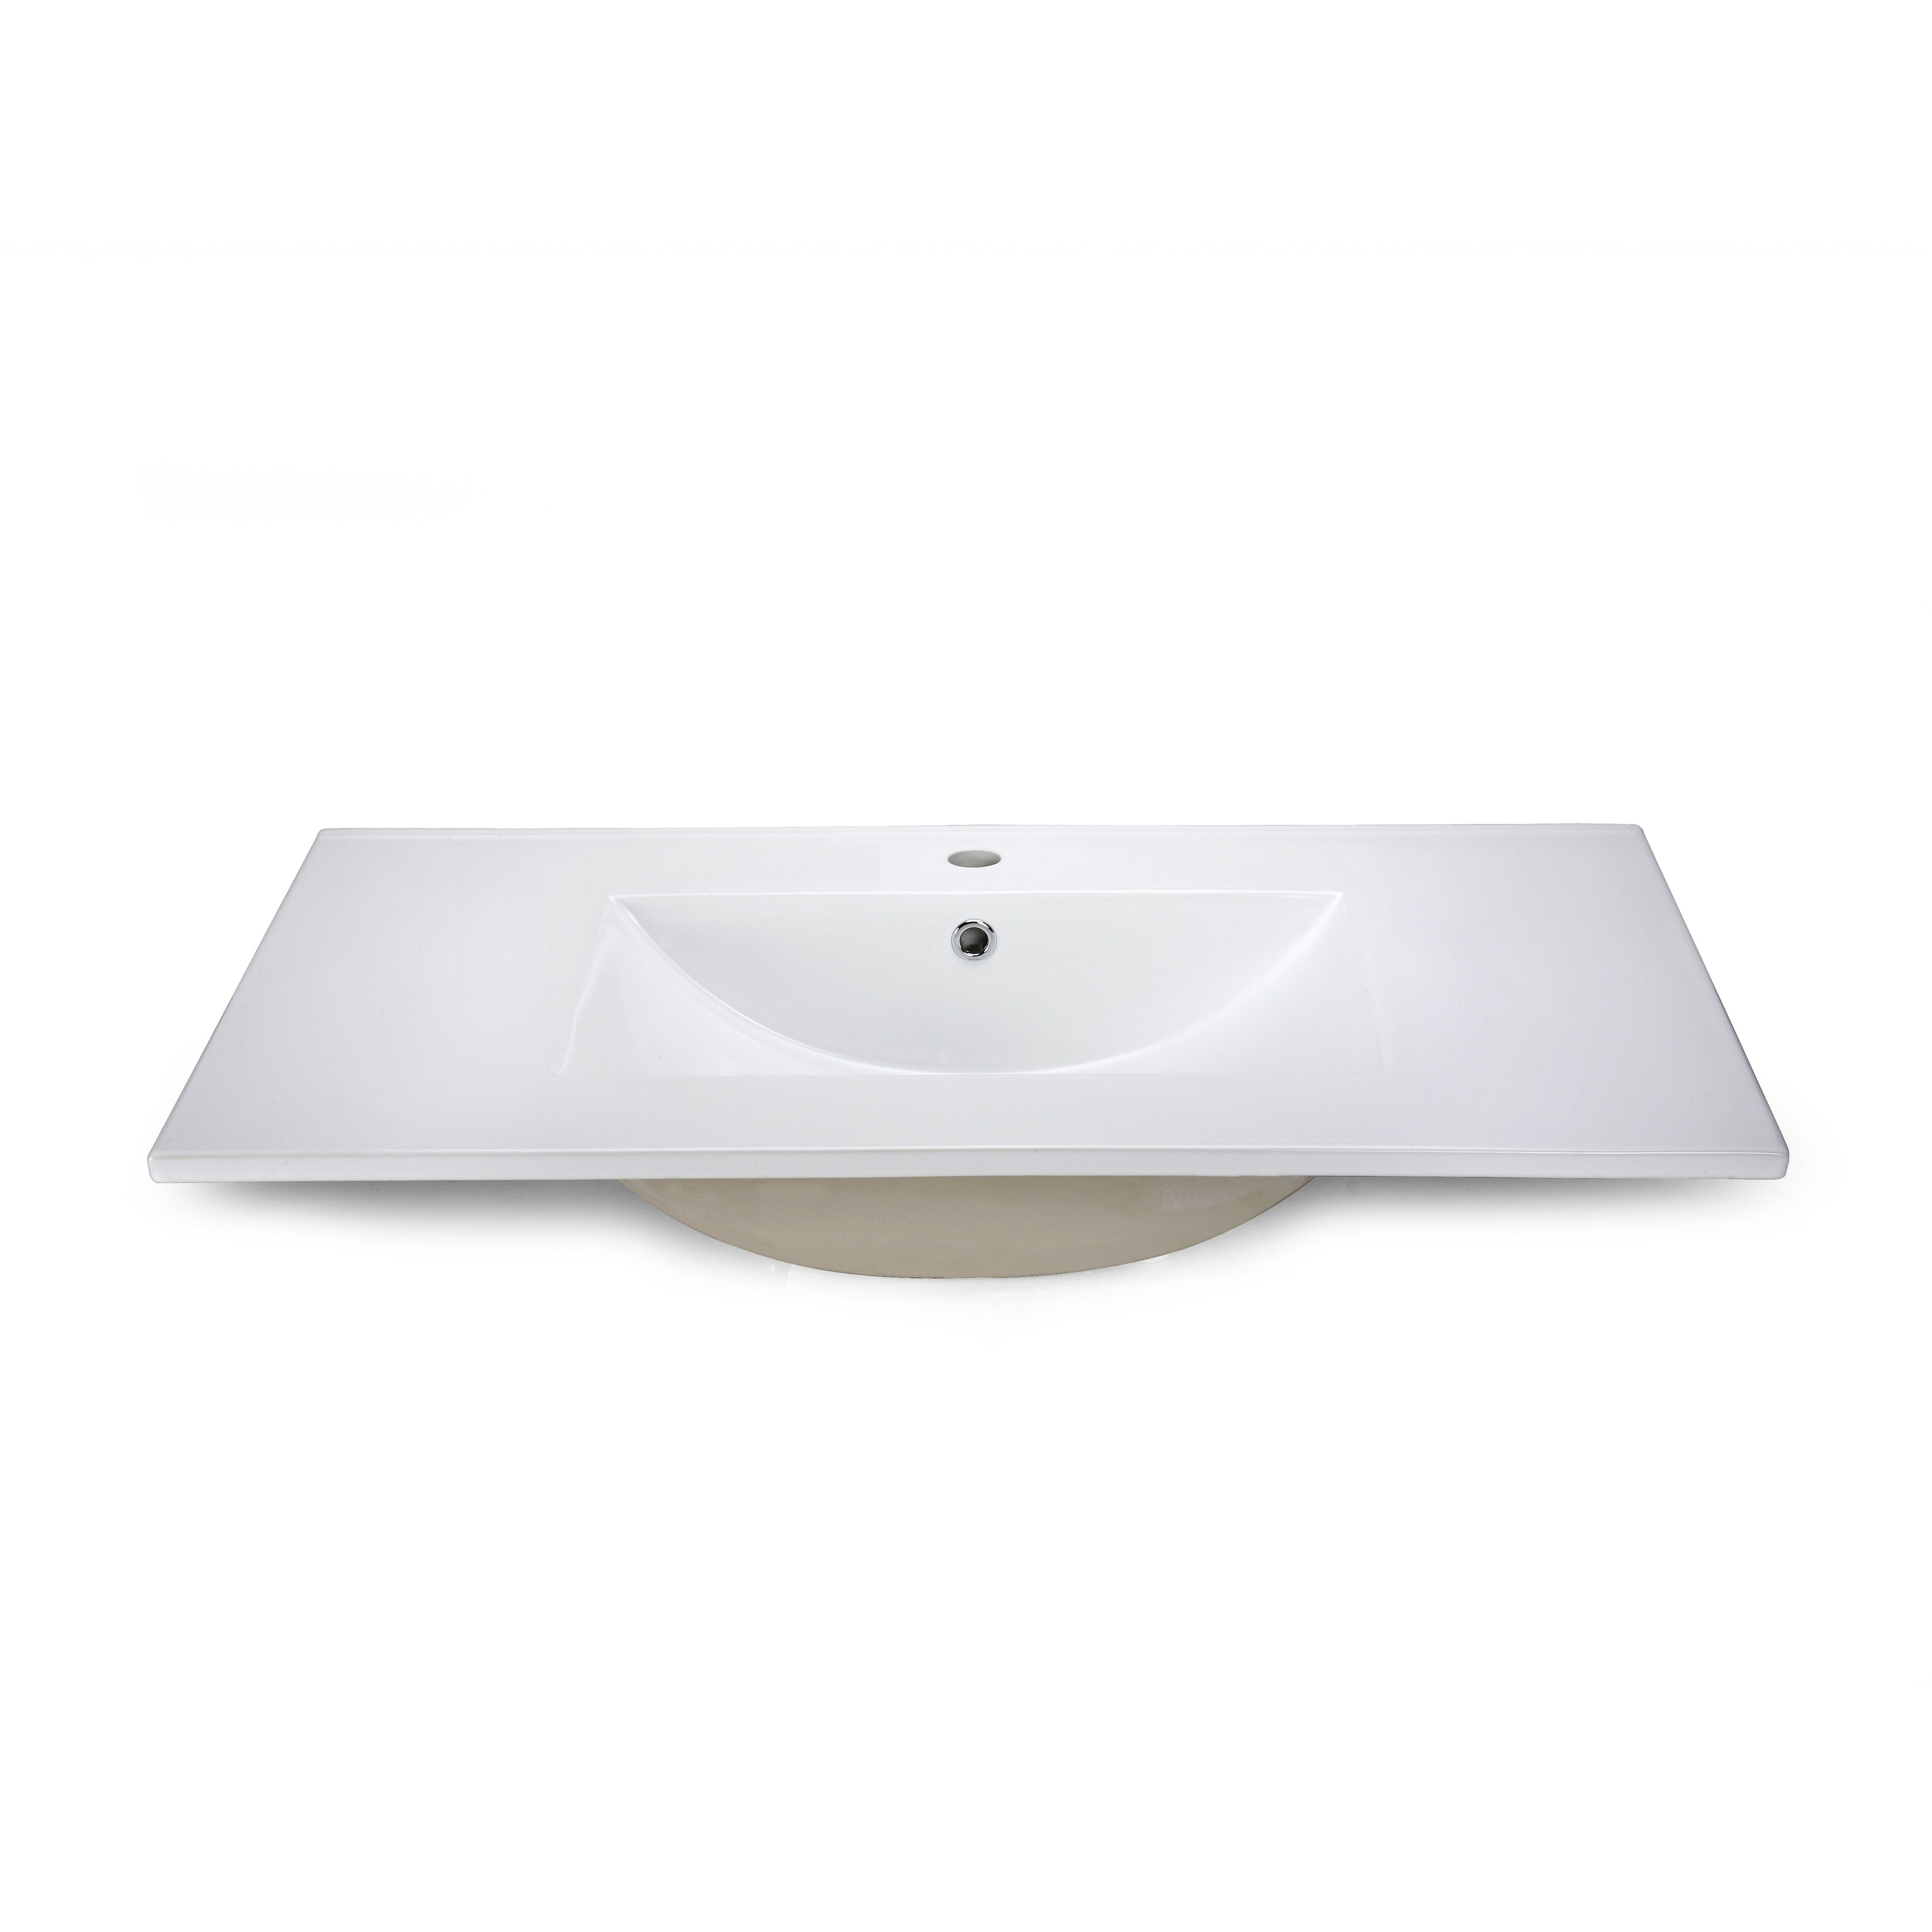 37 X 22 Porcelain Bathroom Vanity Top With Backsplash Google Search